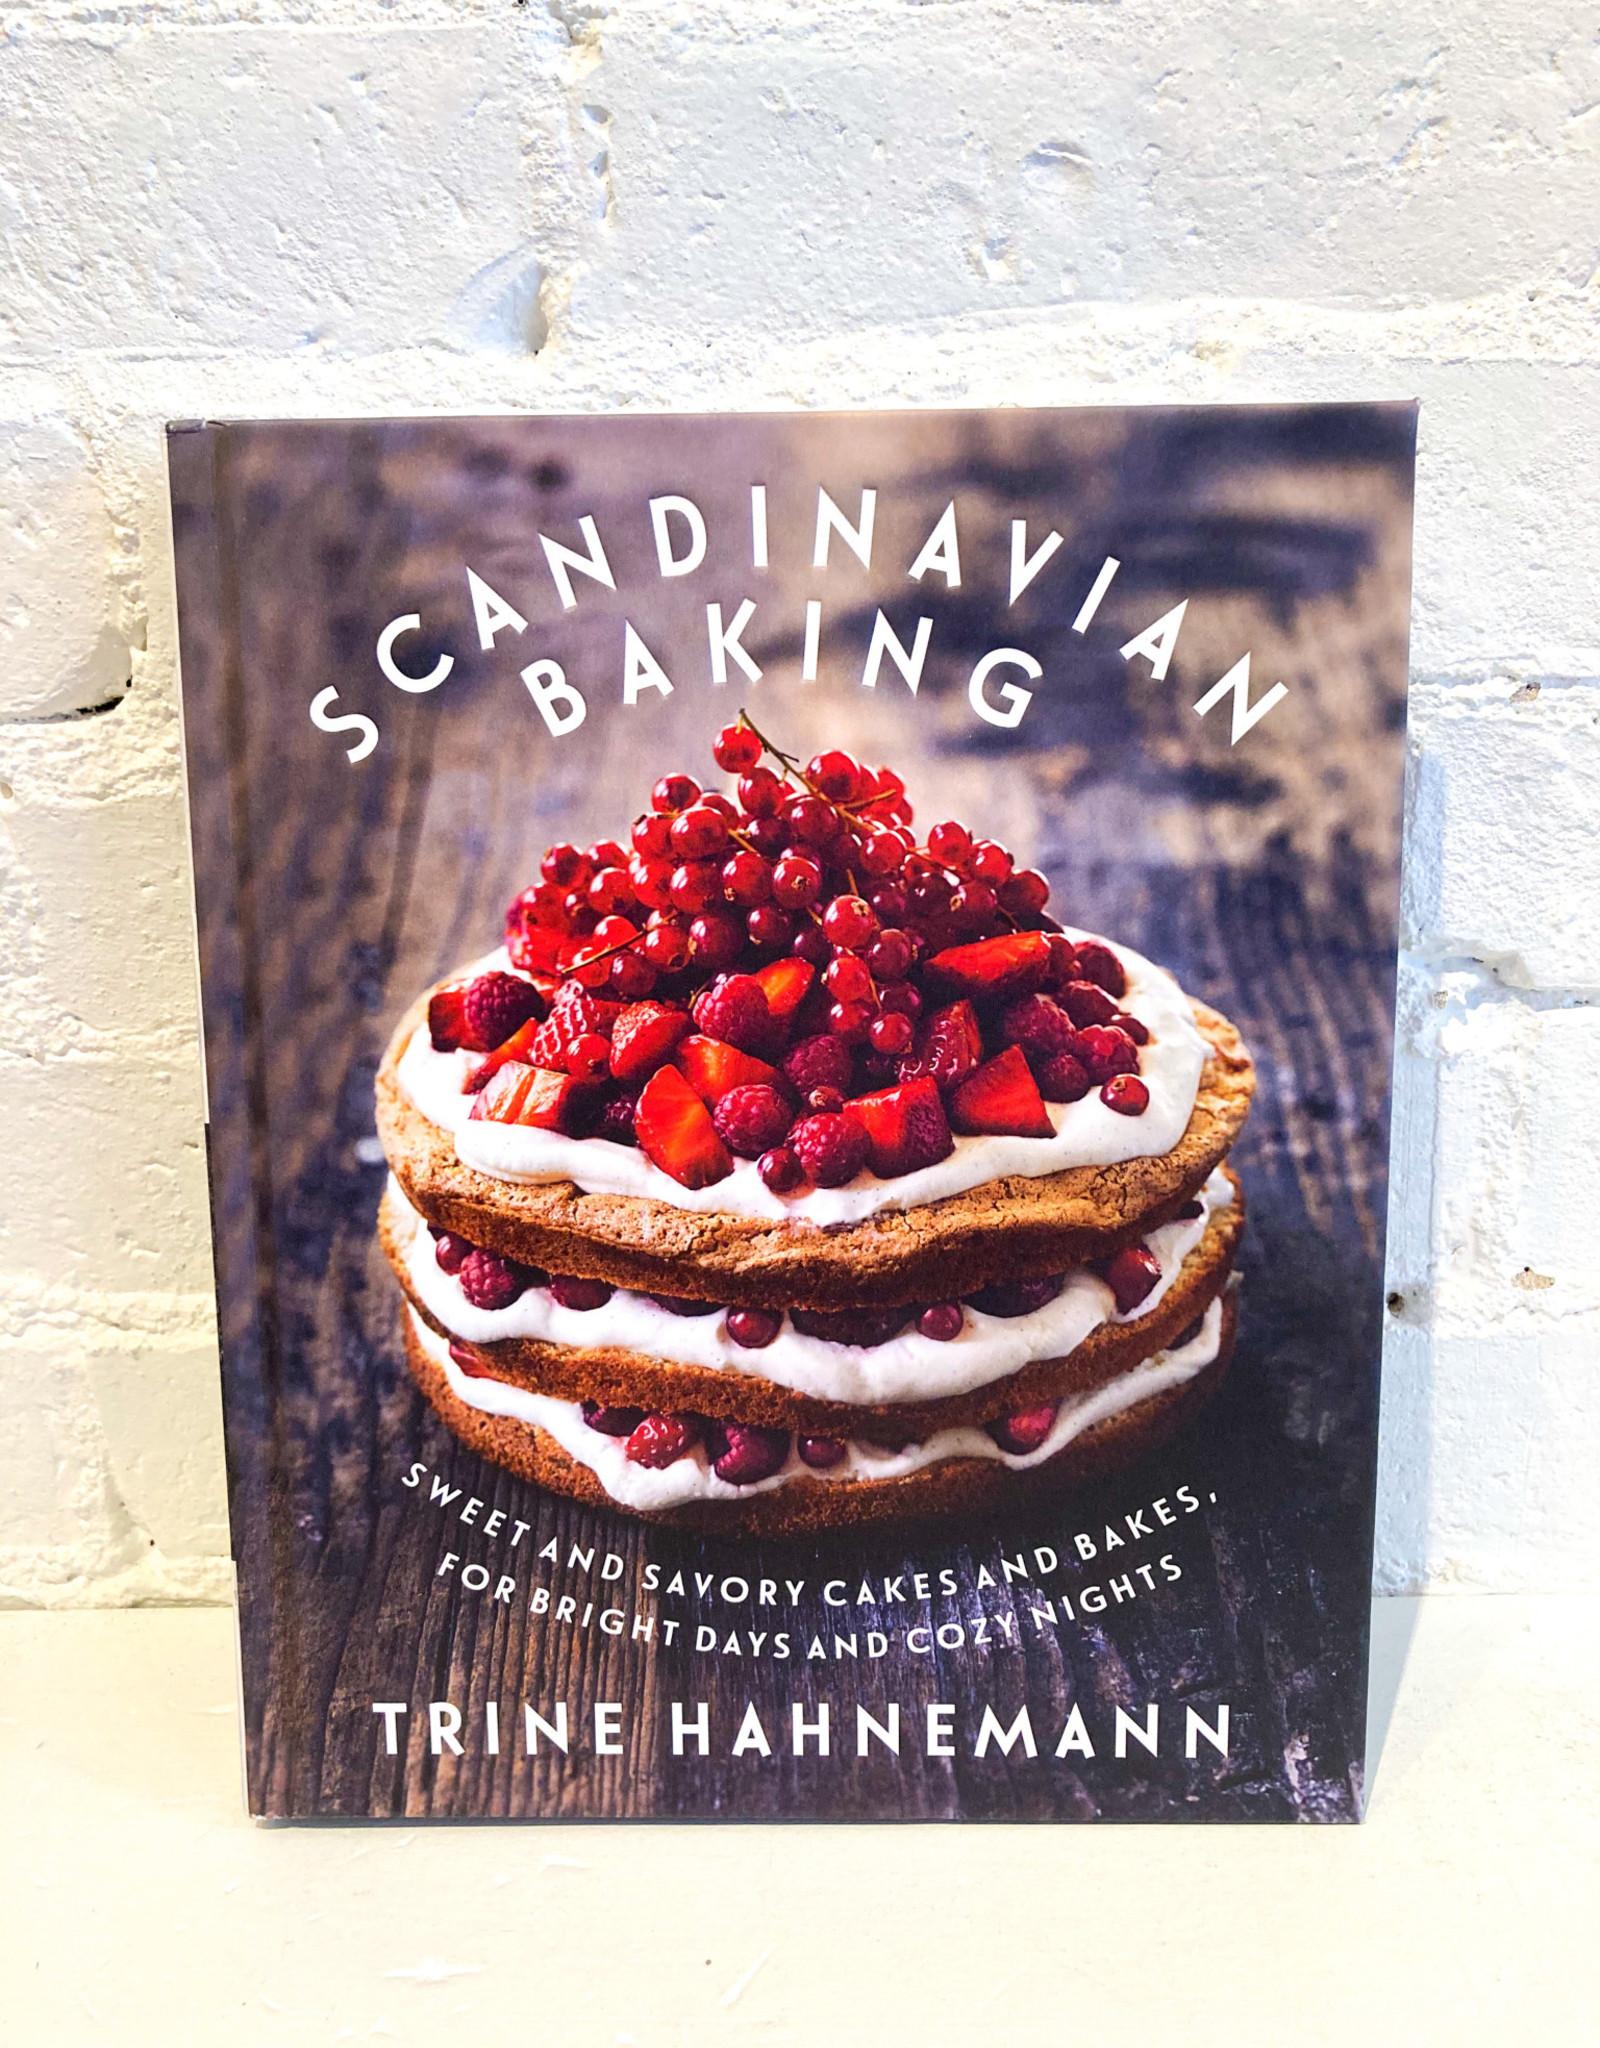 Scandinavian Baking by Trine Hahnemann